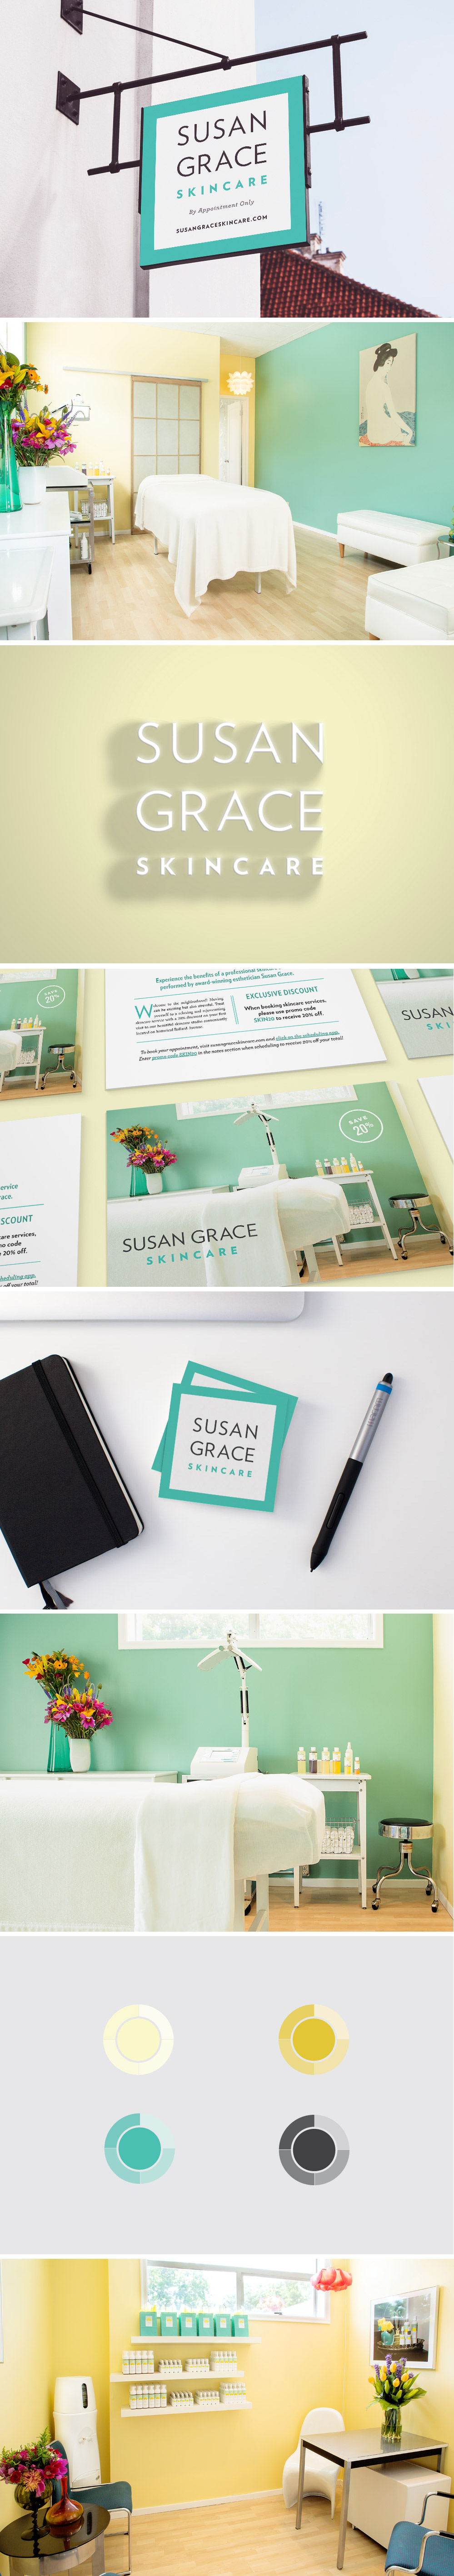 Branch   Susan Grace Skincare